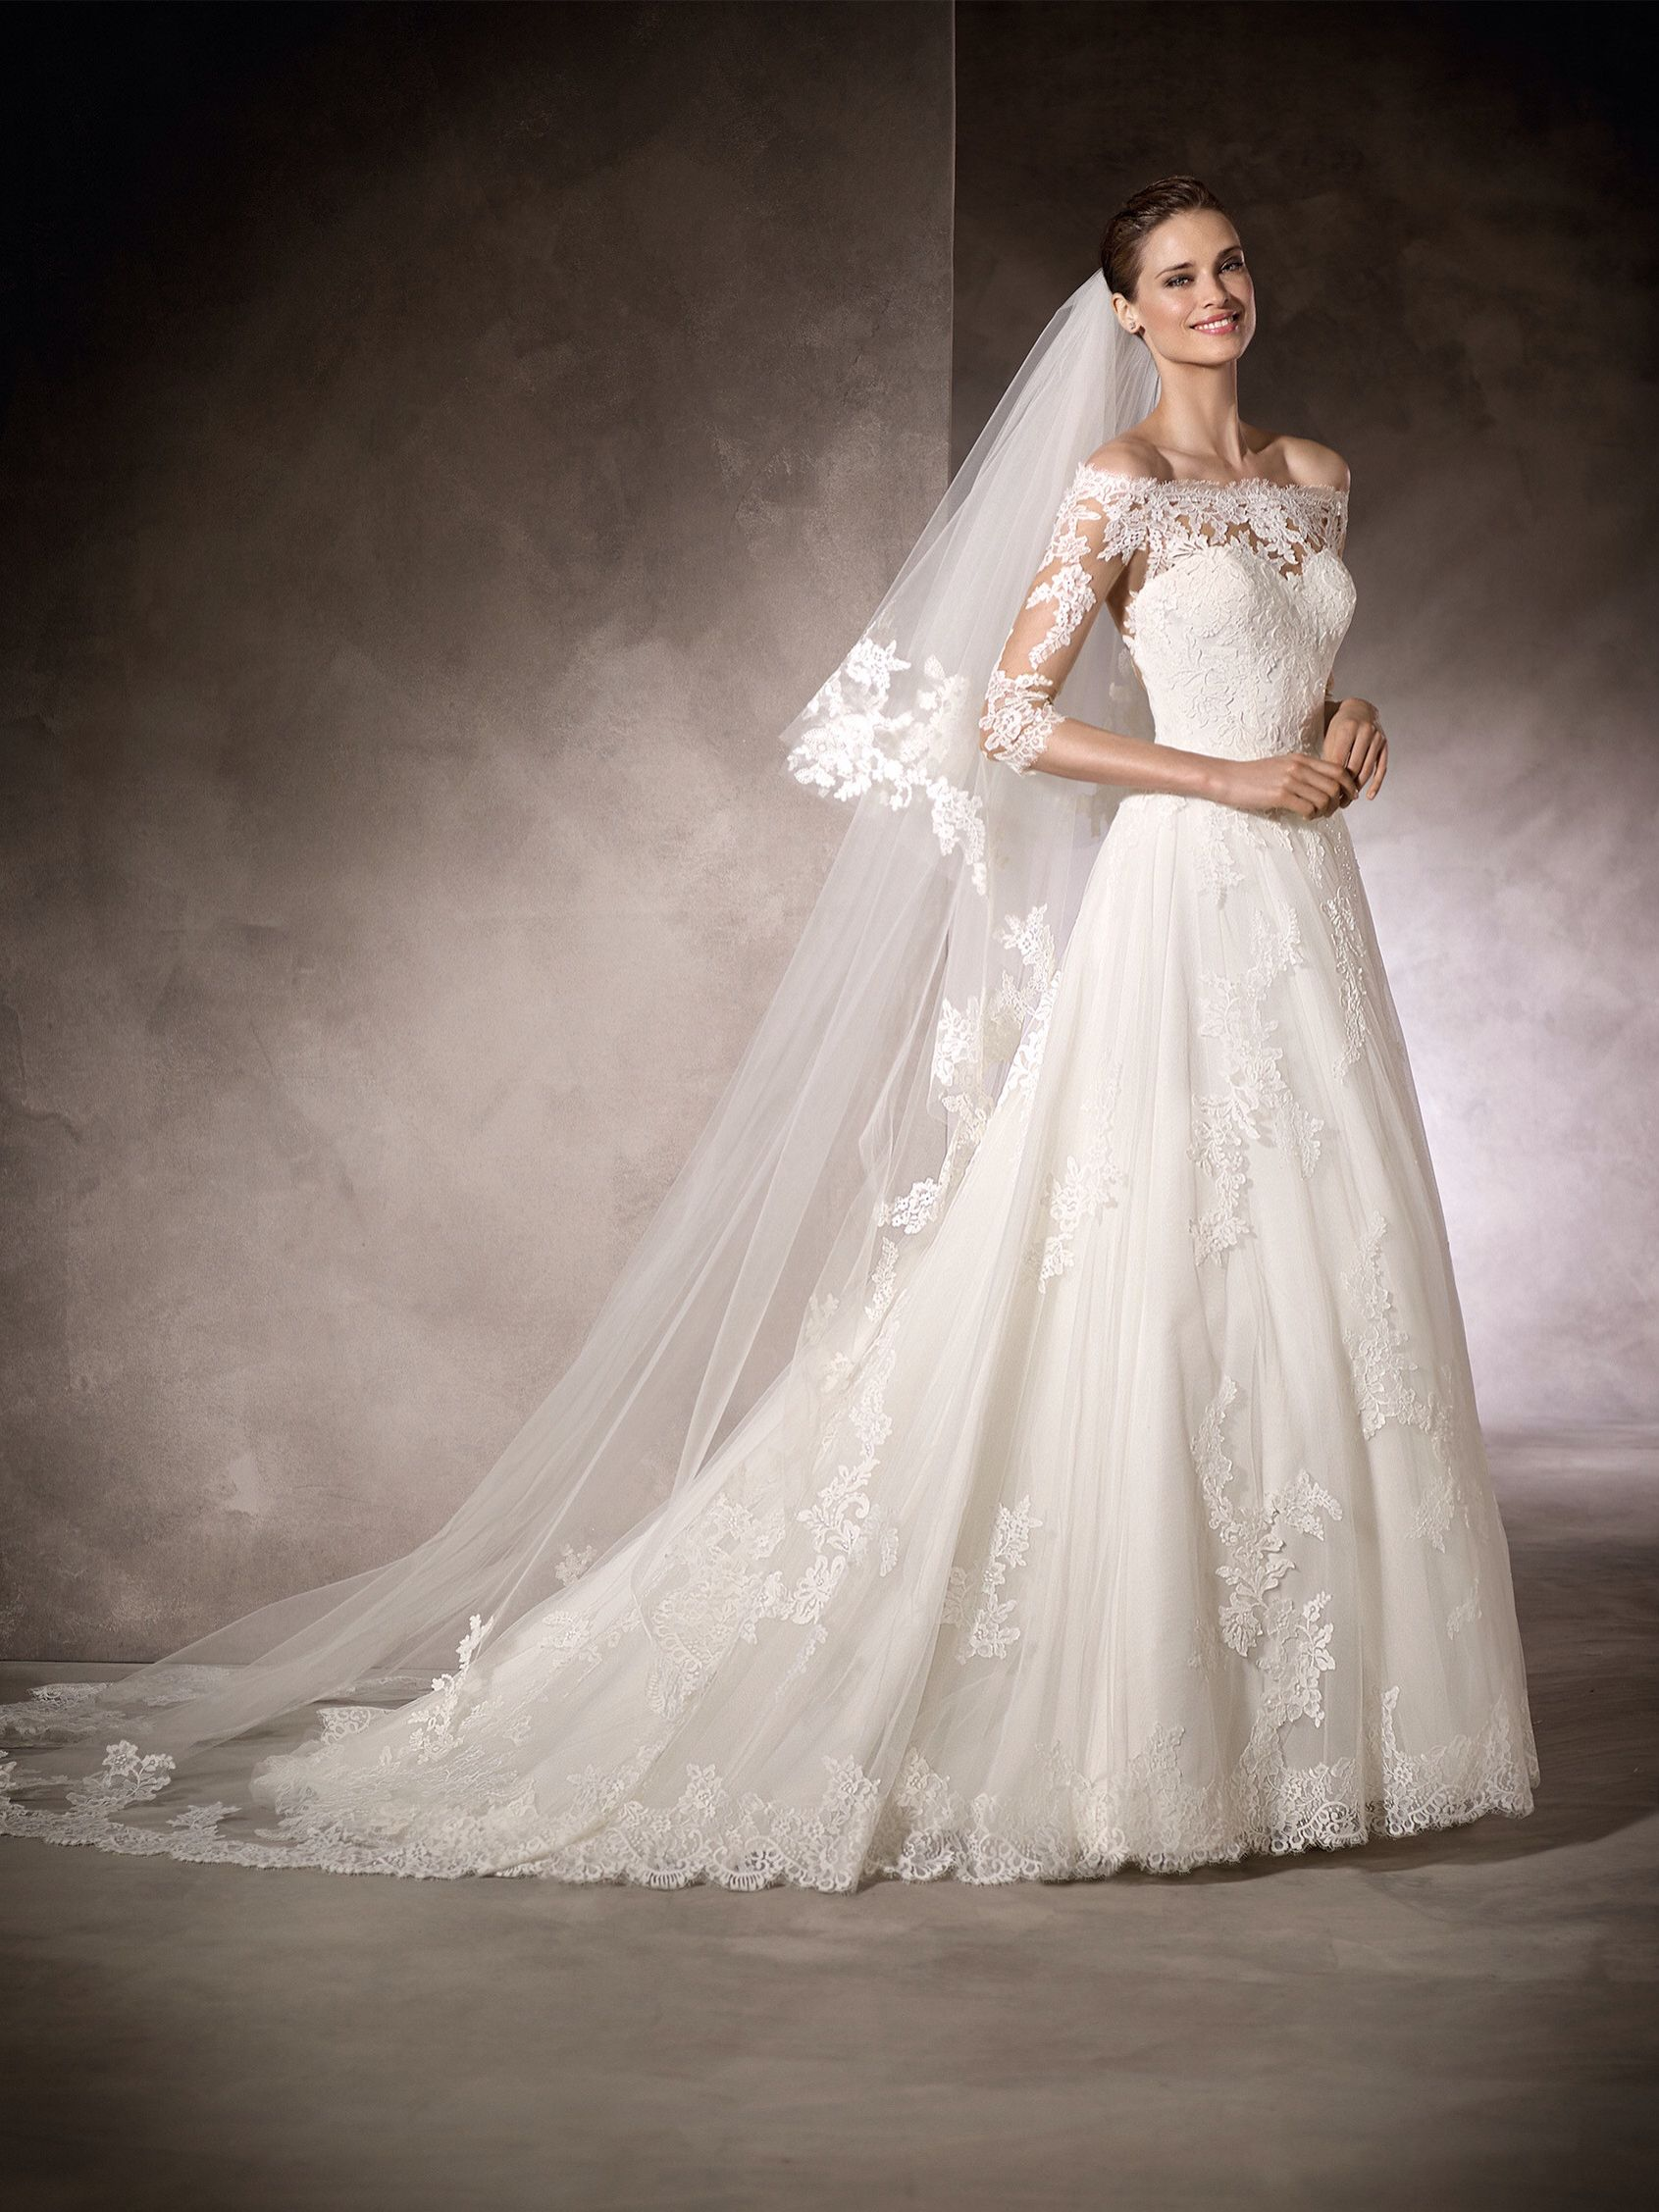 3c41bfe0e6f24 Pronovias One Kimba wedding dress with 3/4 sleeves/ off shoulder neckline/  lace